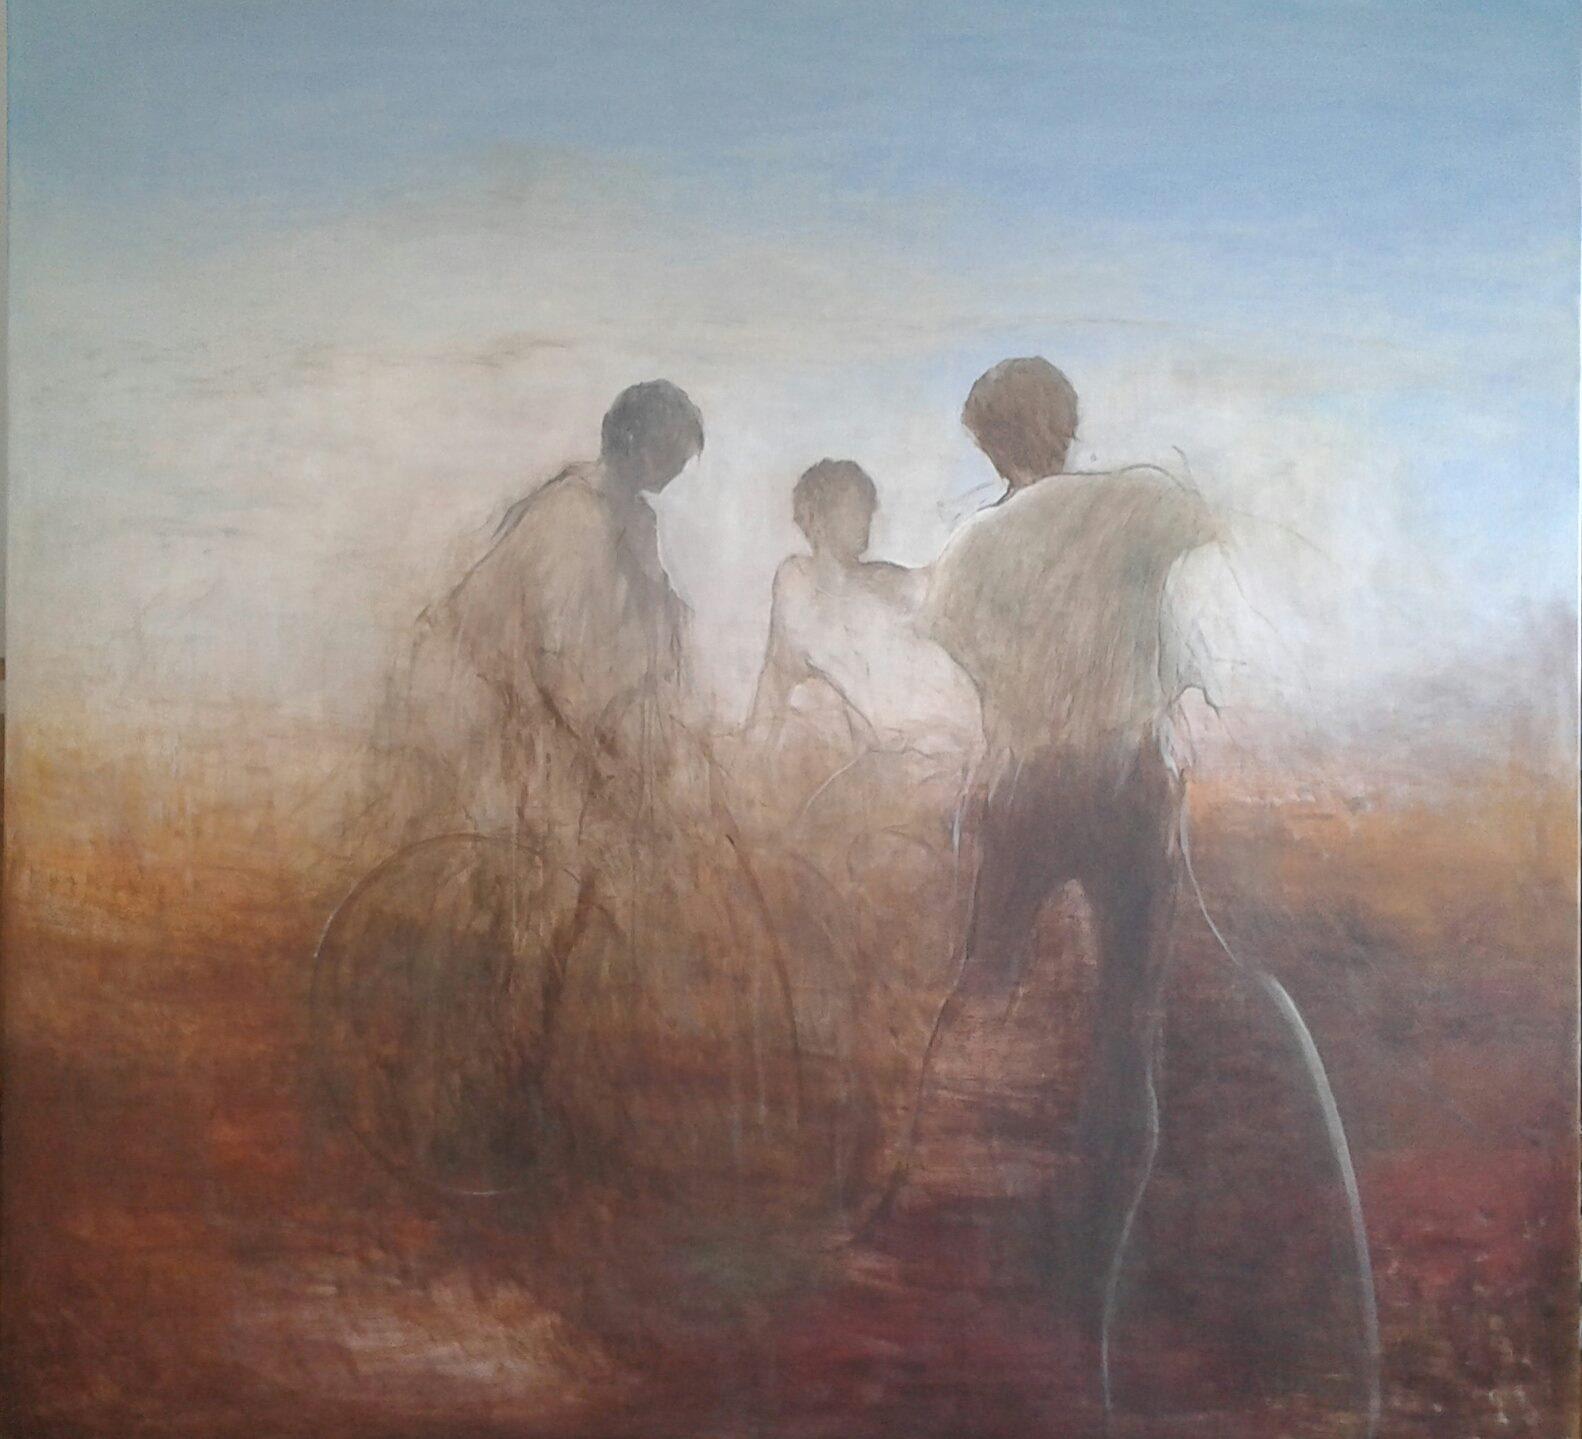 Tuval, yağlıboya 187 x 200 cm